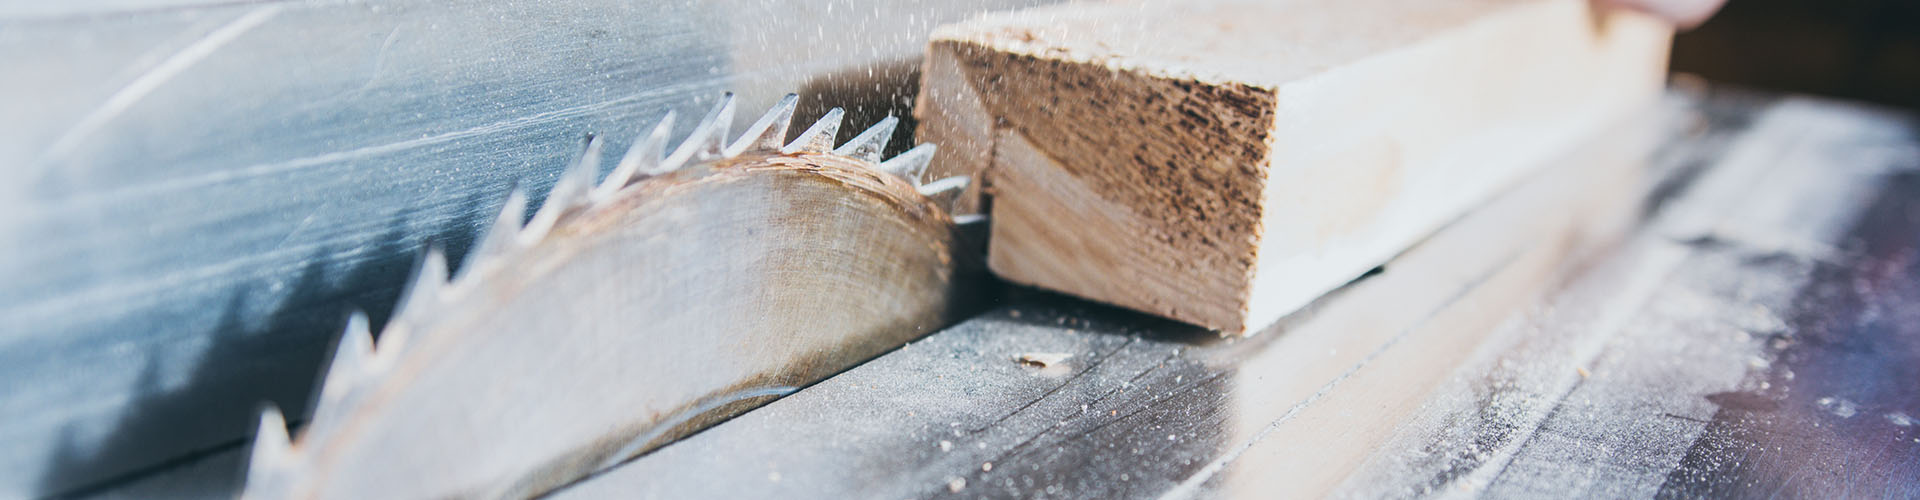 Carpenter using circular saw in workshop